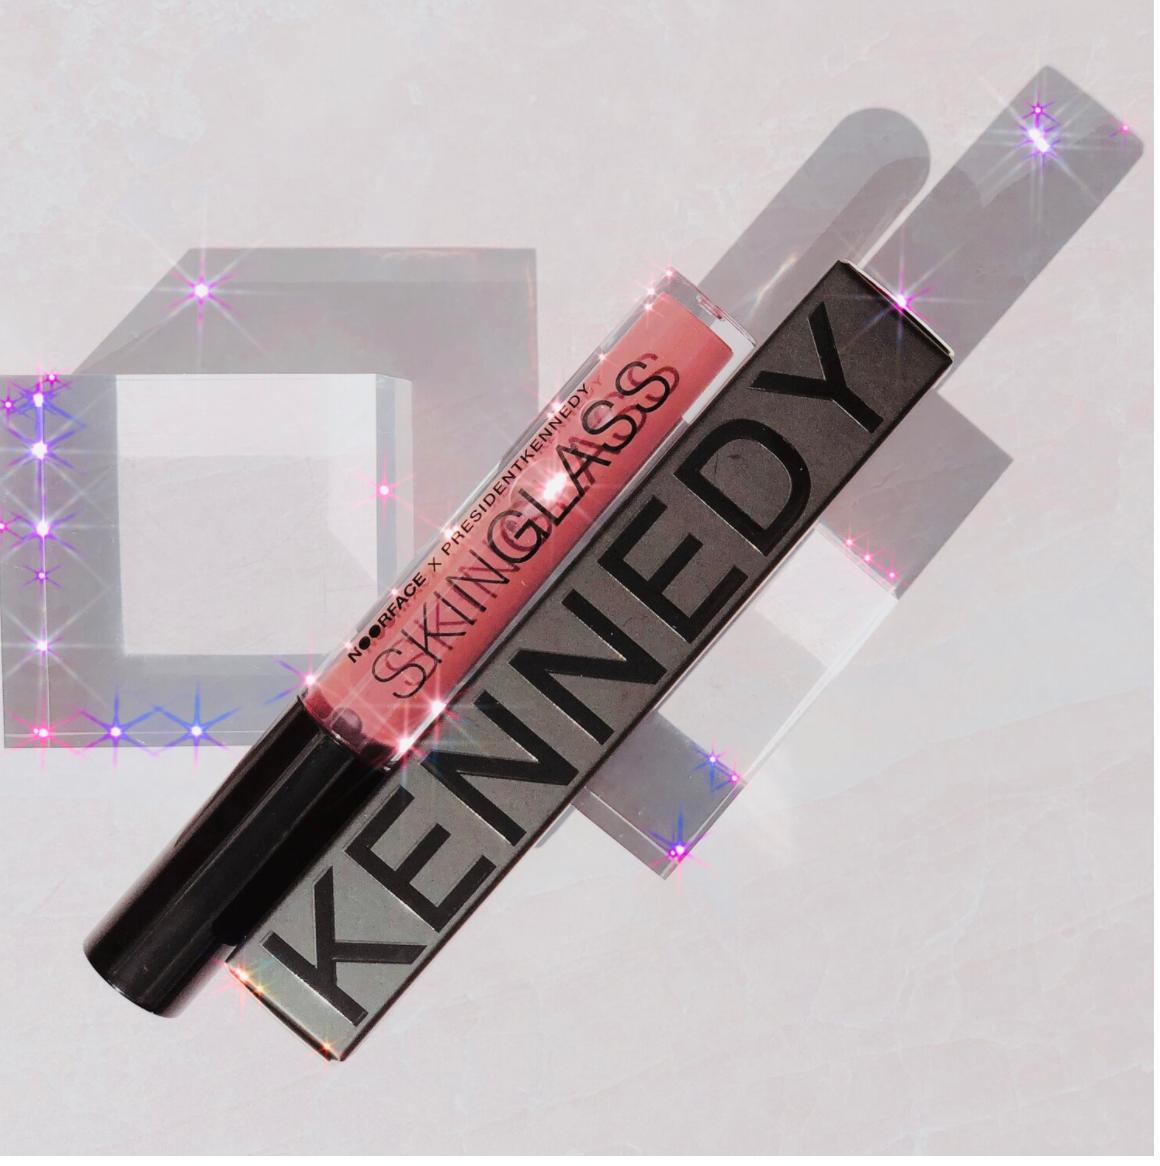 Skinglass X Kennedy Gloss